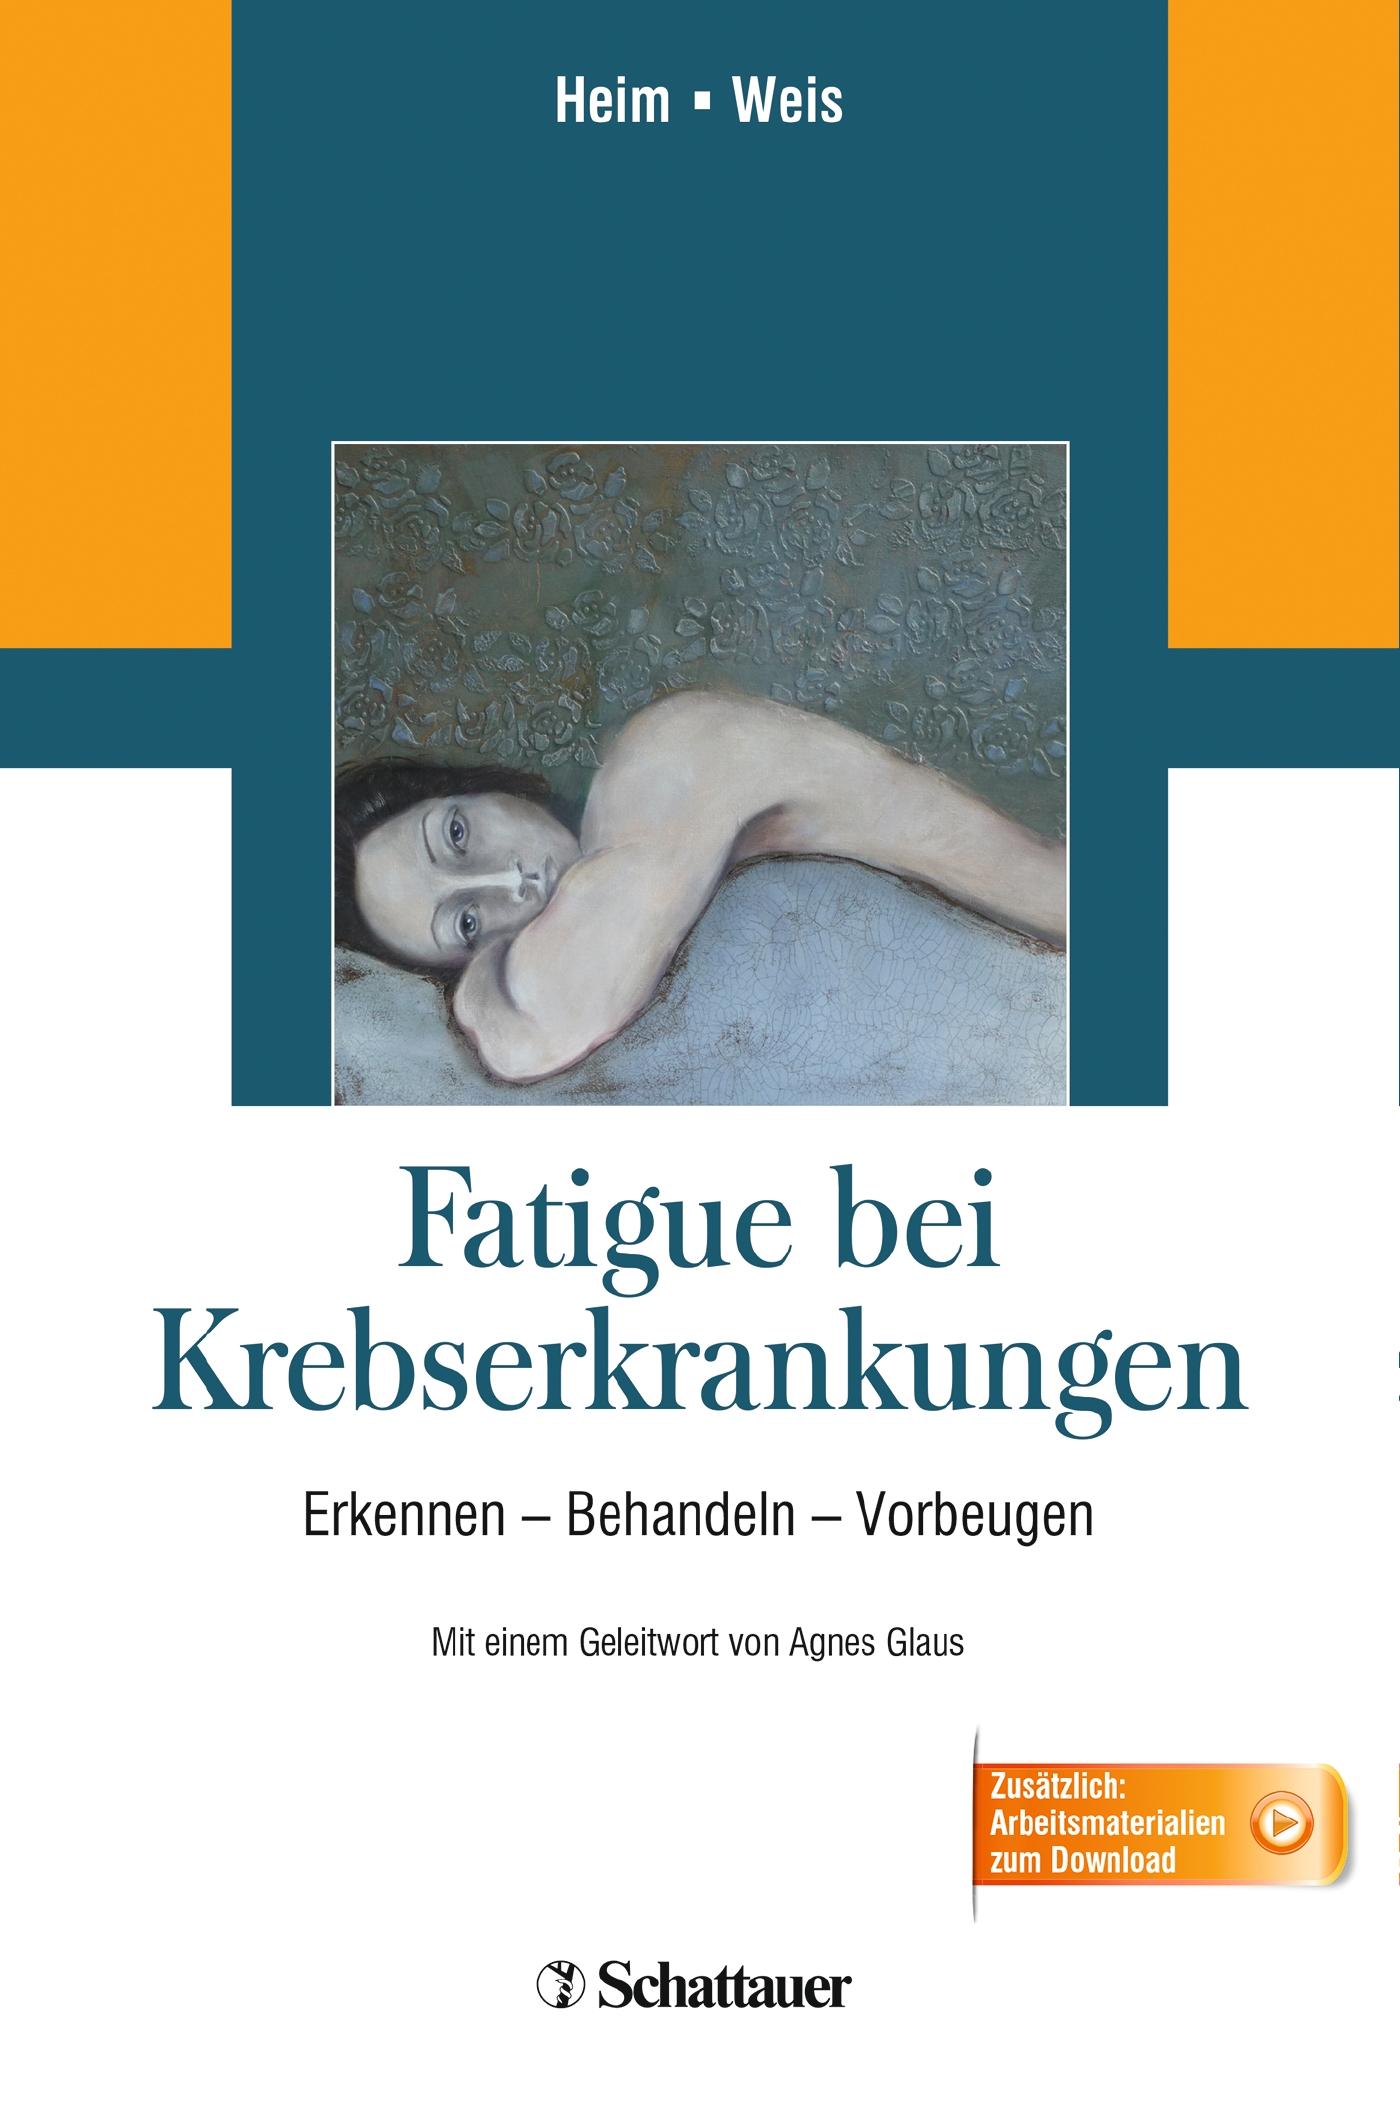 Fatigue bei Krebserkrankungen